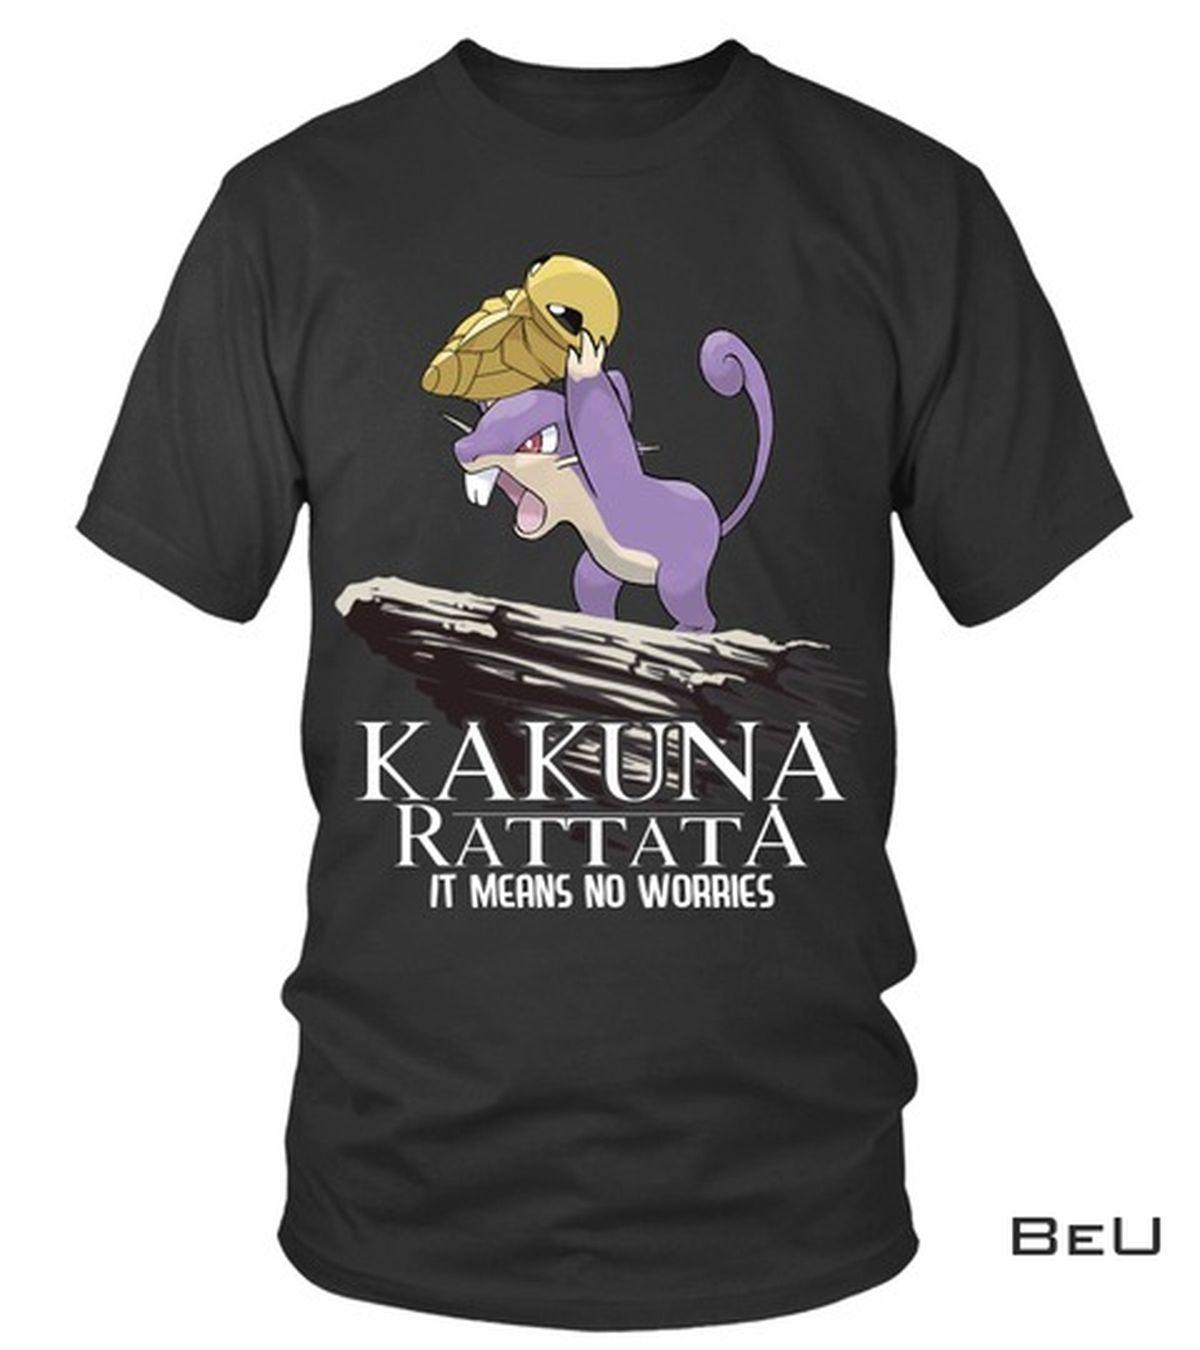 Pokemon Kakuna Rattata It Means No Worries Shirt